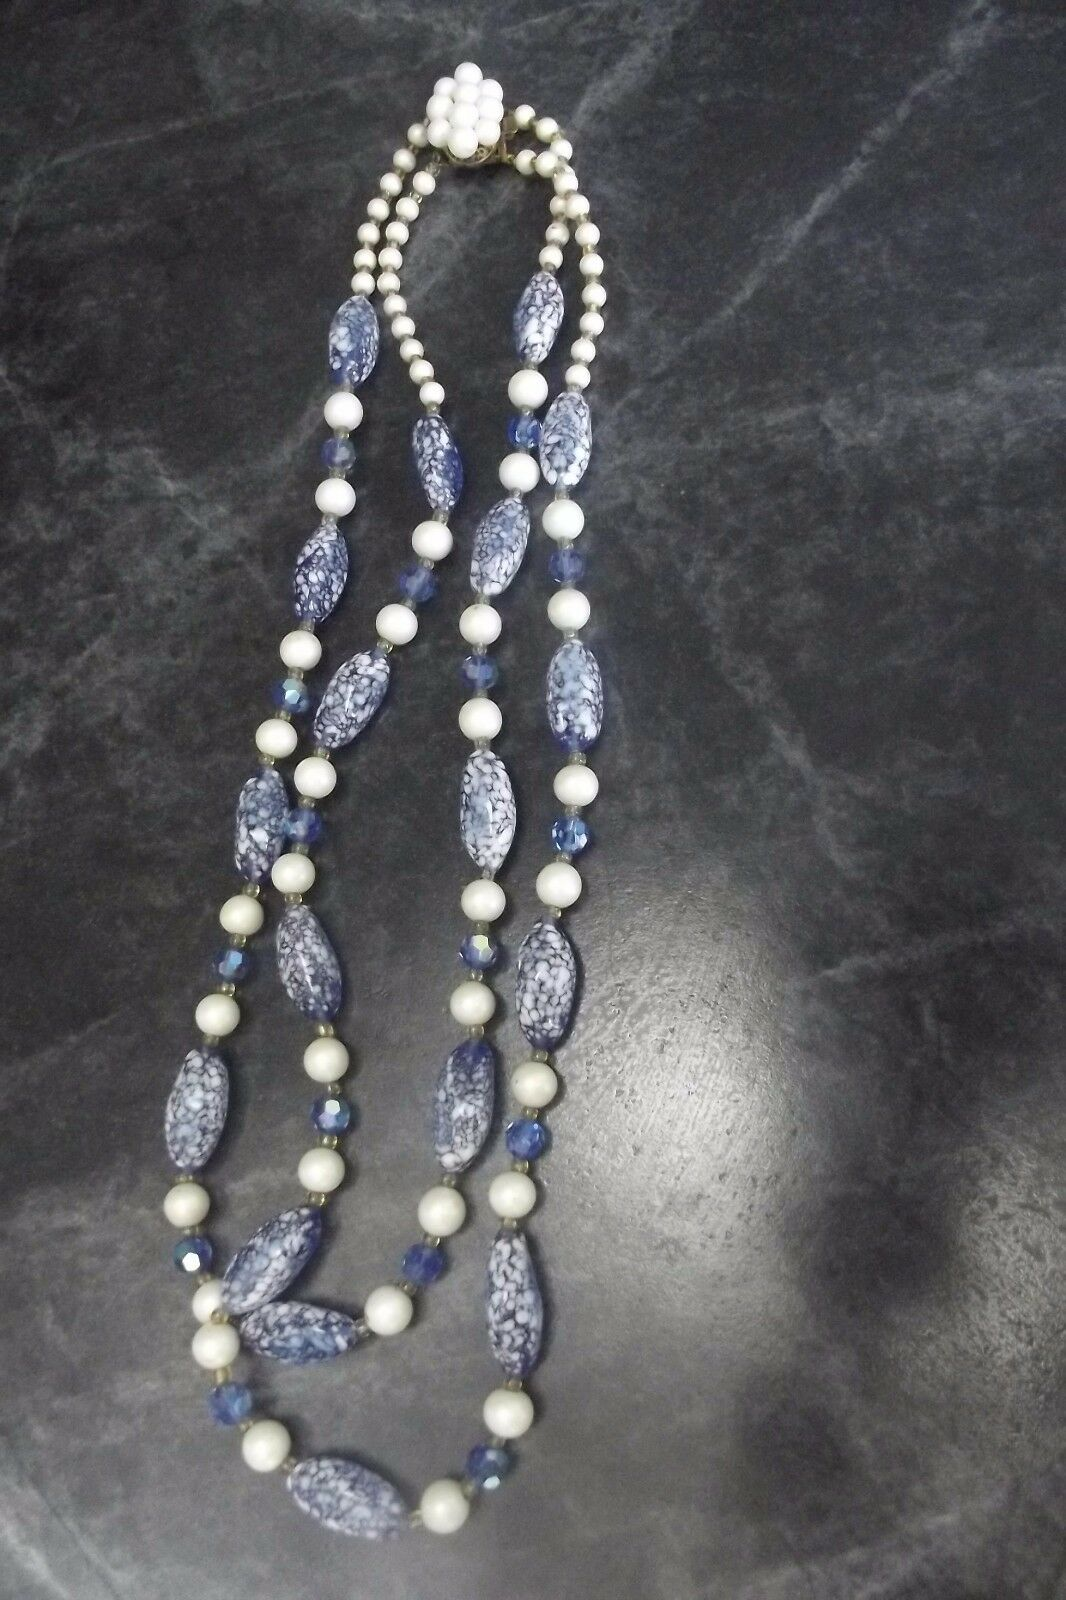 COLLIER ANCIEN 2 Rangs en Chute Perles Murano  Pâte de Verre blue